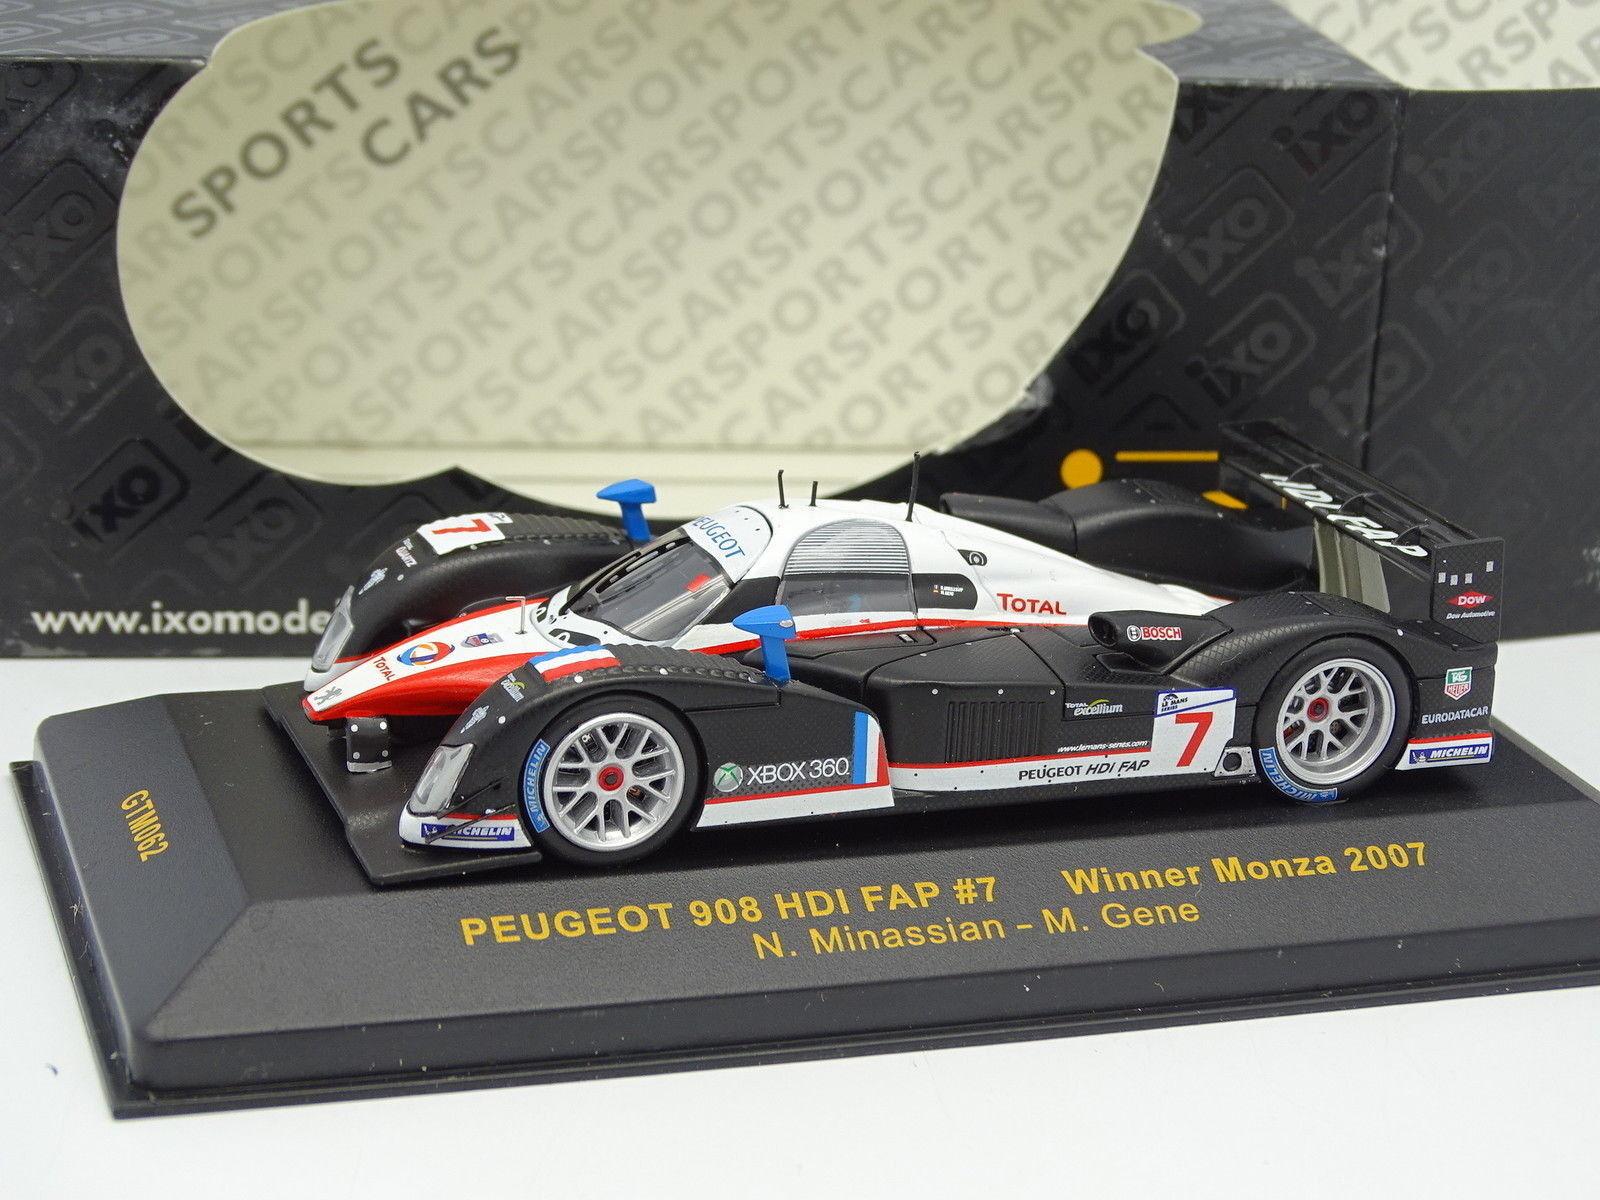 Ixo 1 43 - Peugeot 908 HDI FAP No.7 Winner Monza 2007